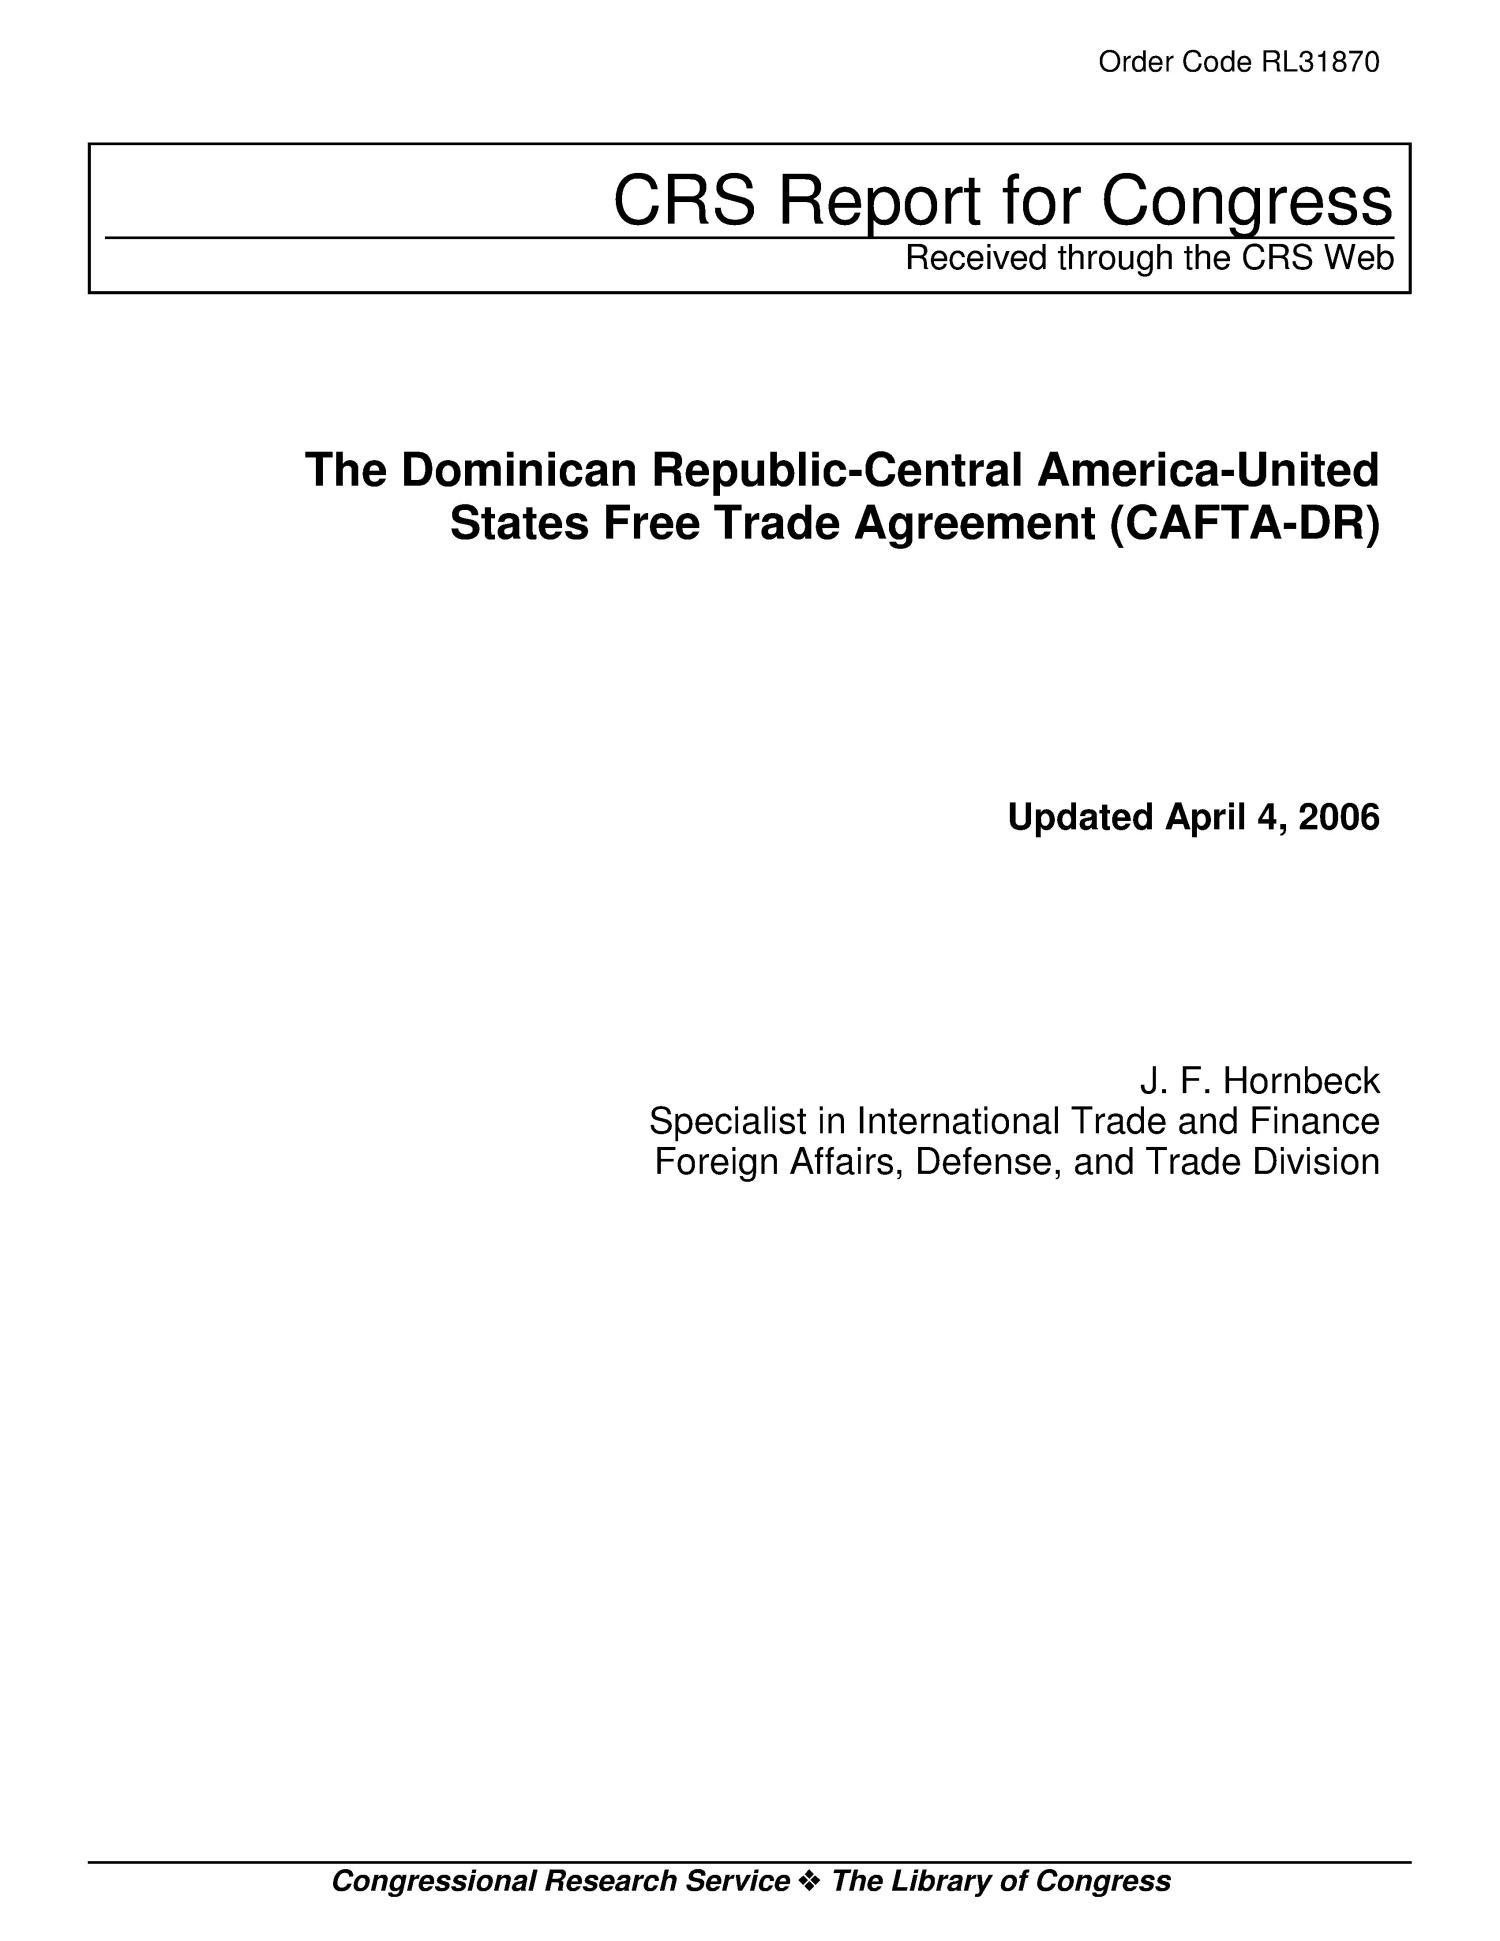 The Dominican Republic Central America United States Free Trade